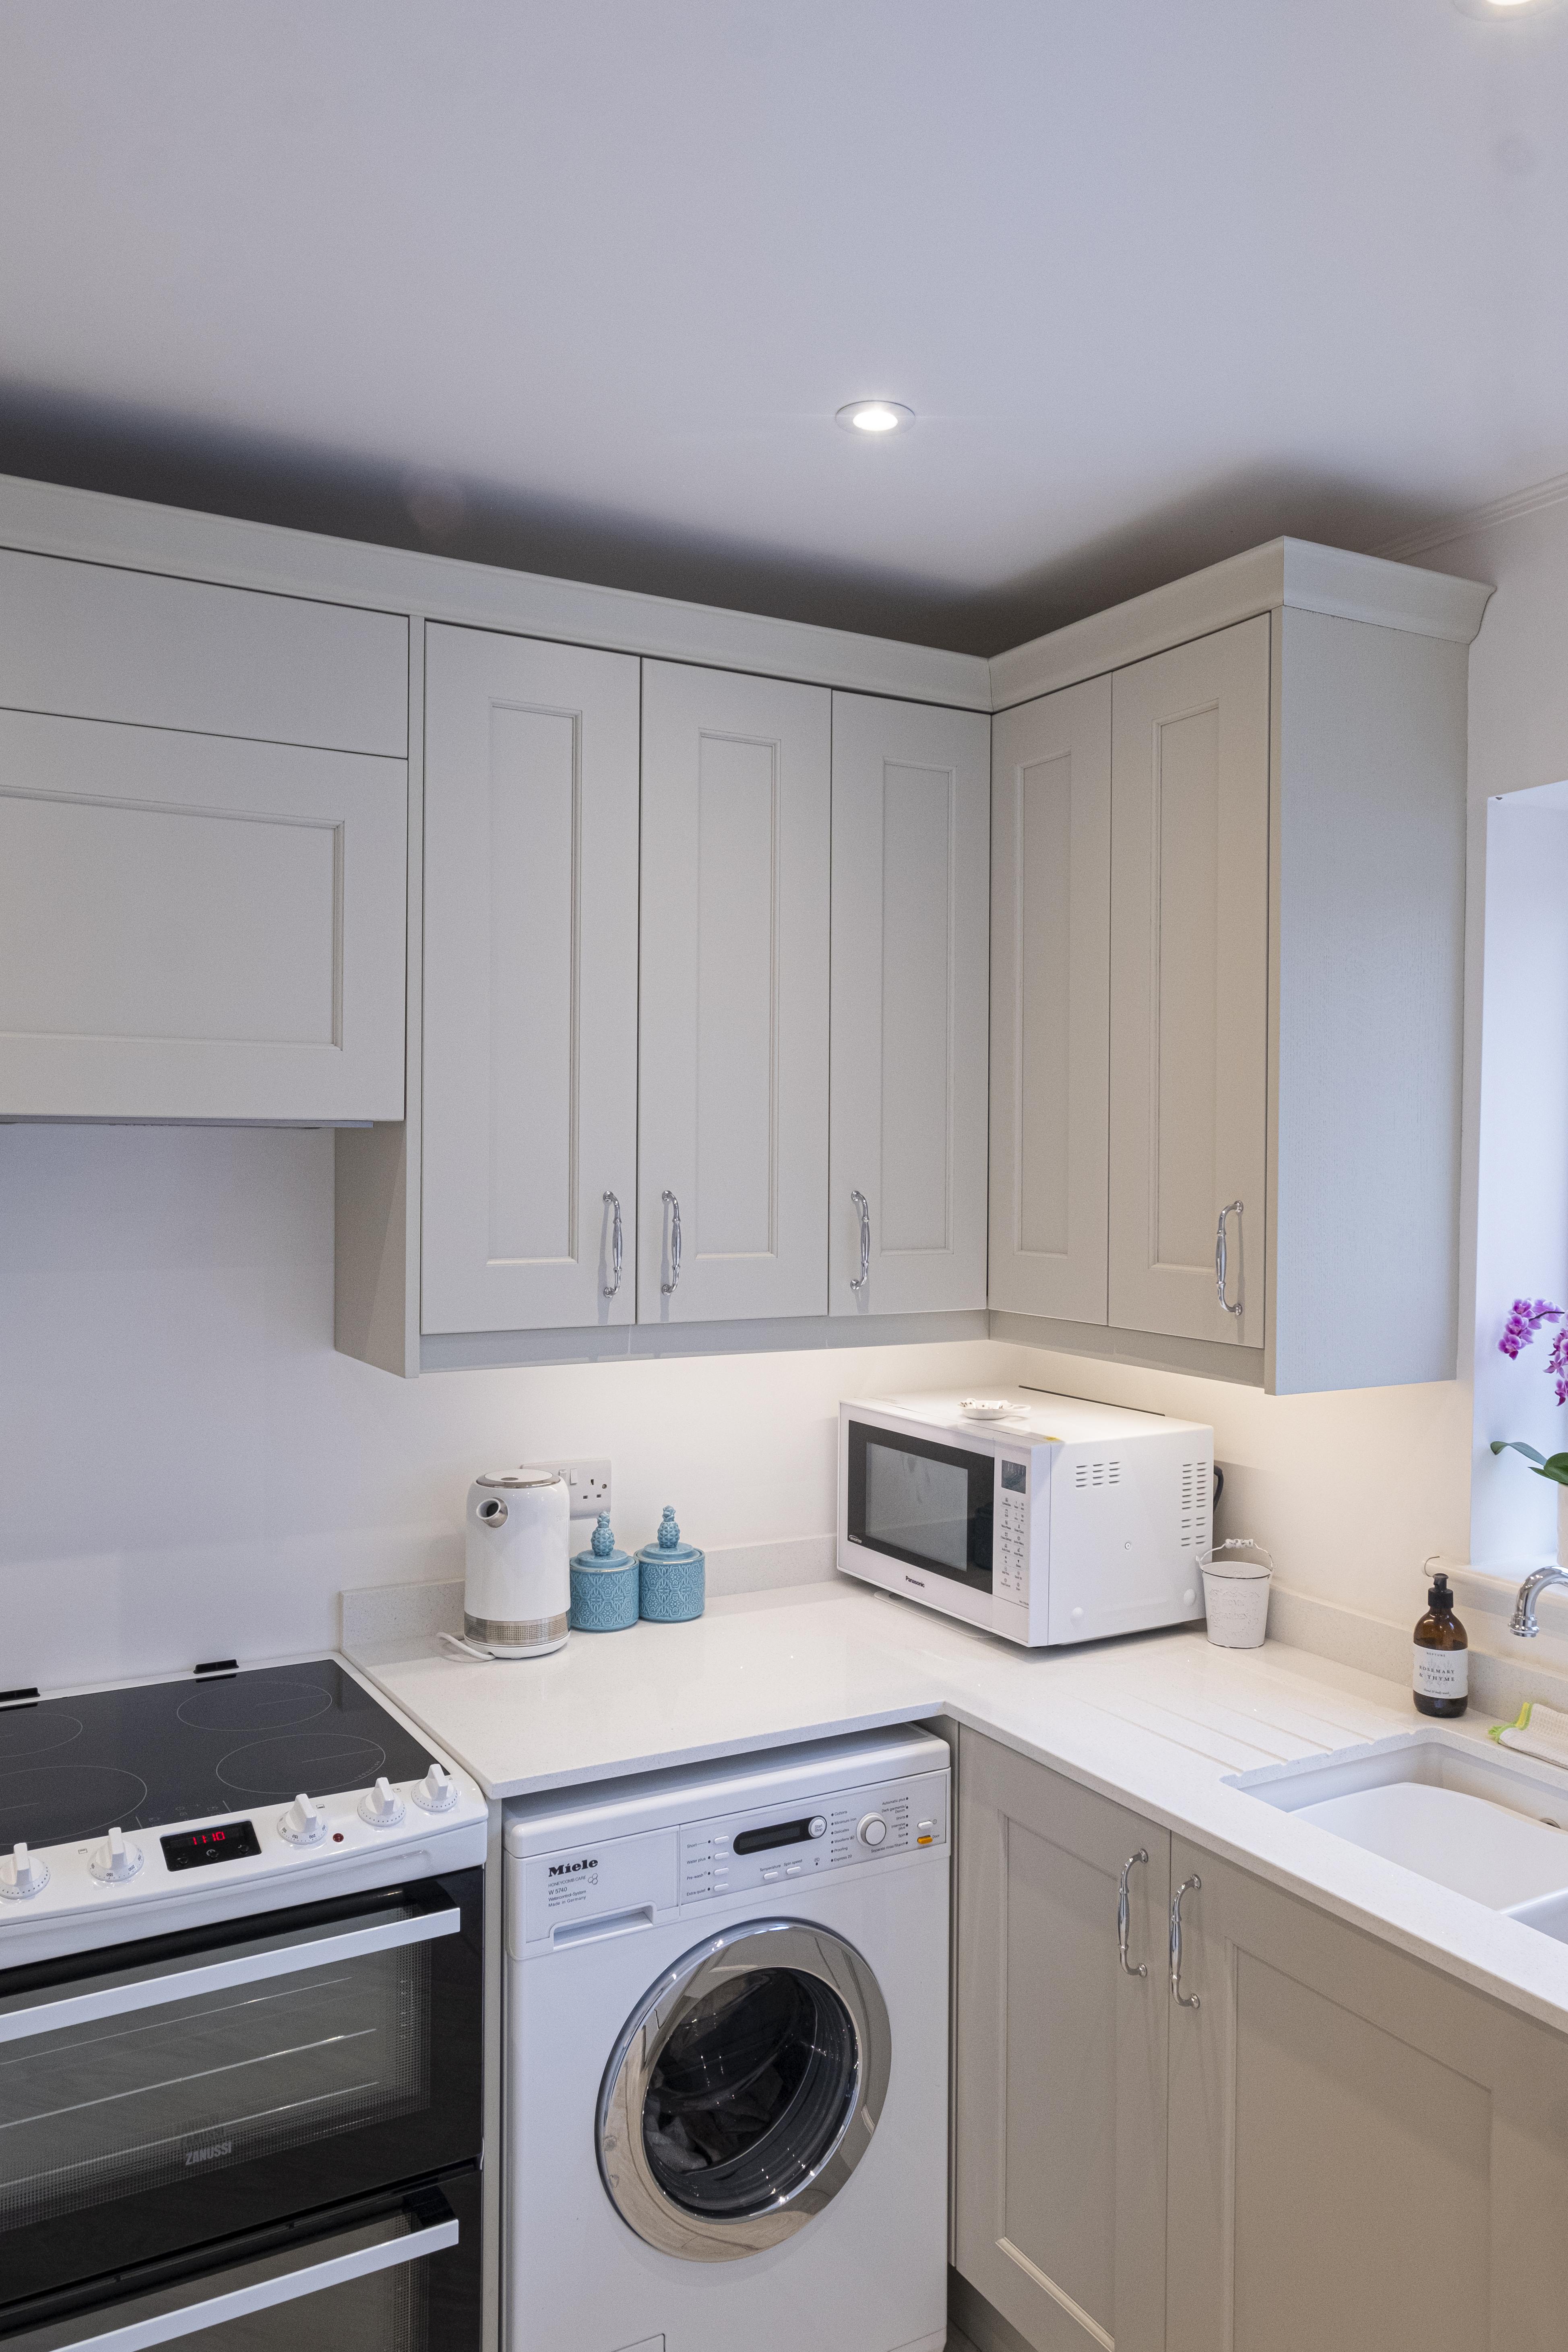 Mussel Shaker kitchen by Charmaine ULYATE | Raison Home UK - 2